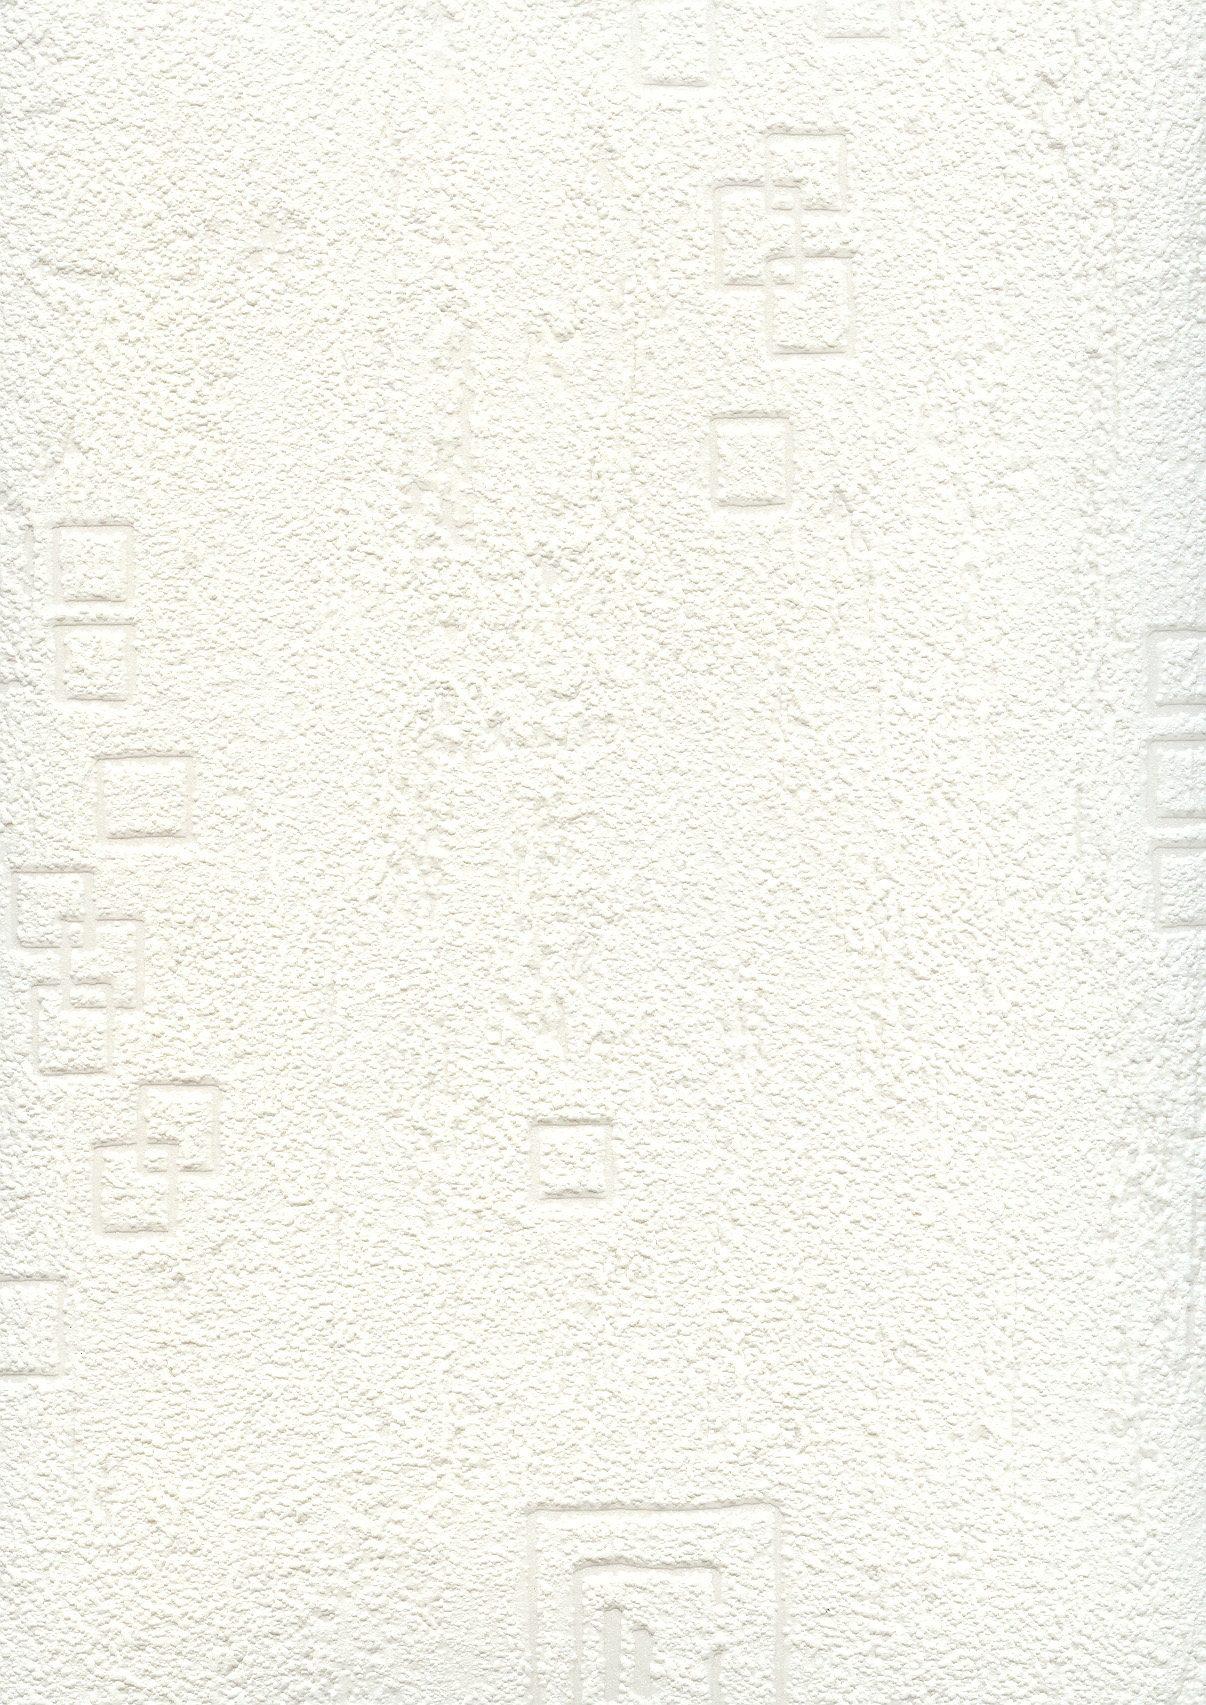 Papiertapete, Rasch, »Graffito 1«